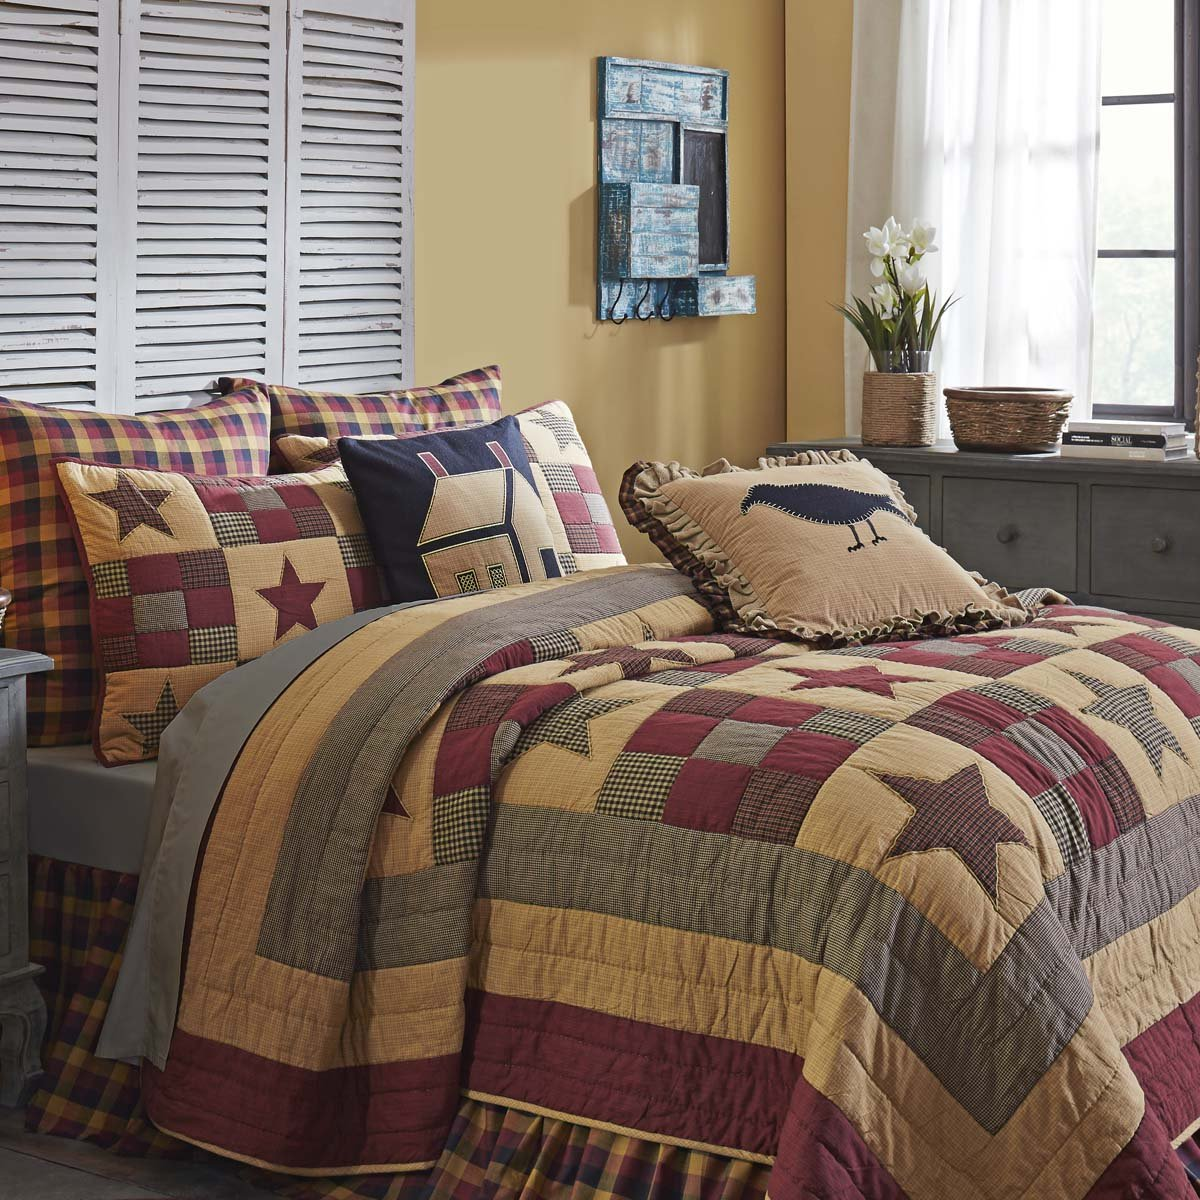 Amazon.com: VHC Brands Hazelwood Quilt Set, Queen: Home & Kitchen